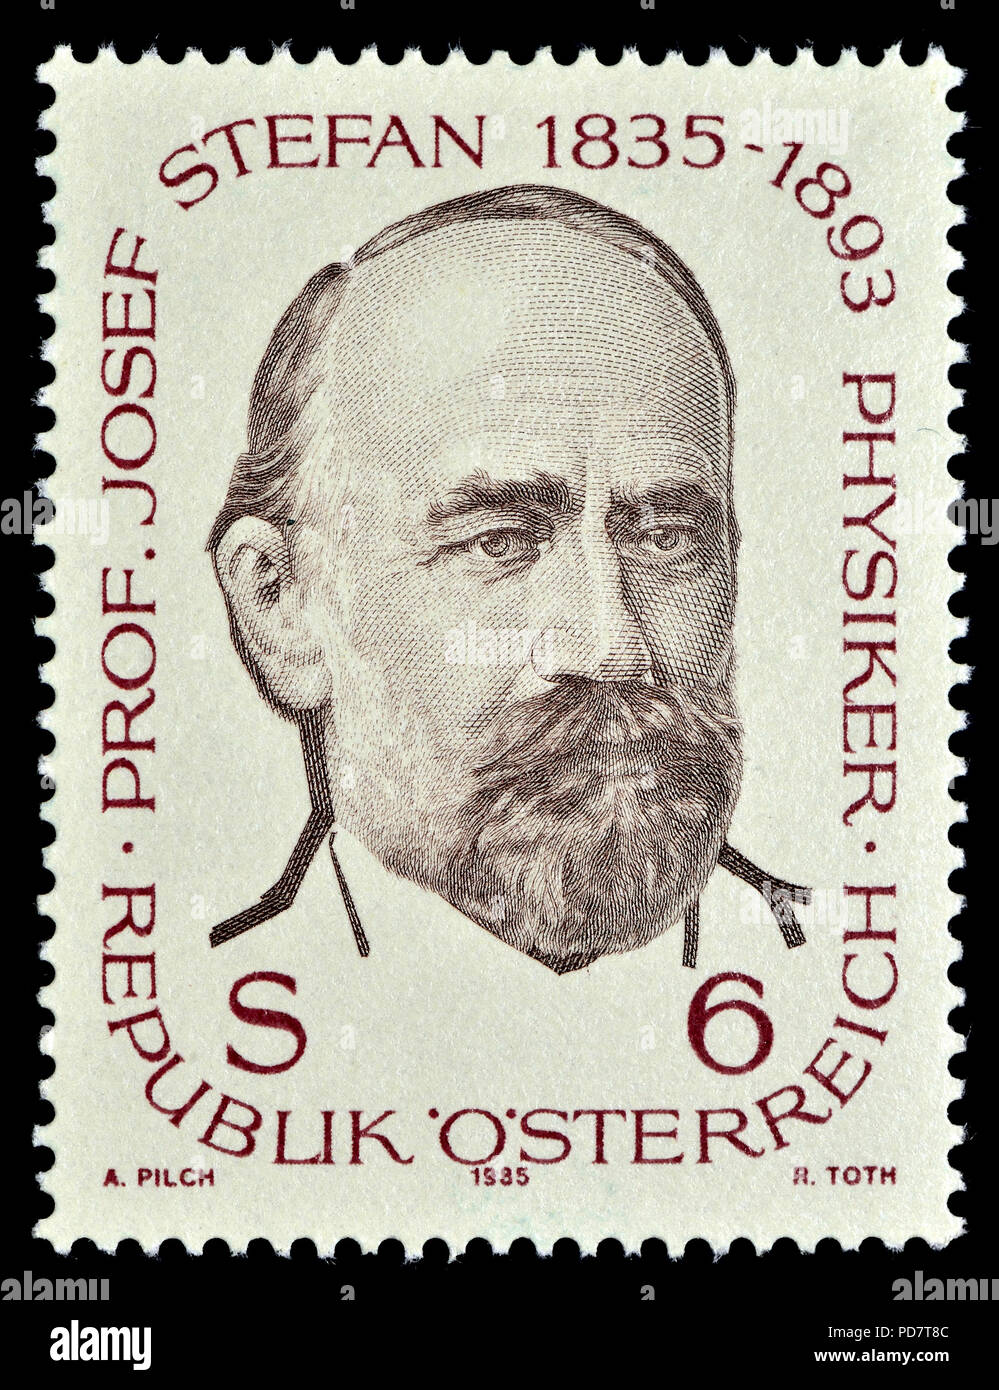 Austrian postage stamp (1985) : Josef Stefan (Slovene: Jožef Štefan; 1835 – 1893) Carinthian Slovene physicist, mathematician, and poet of the Austria - Stock Image